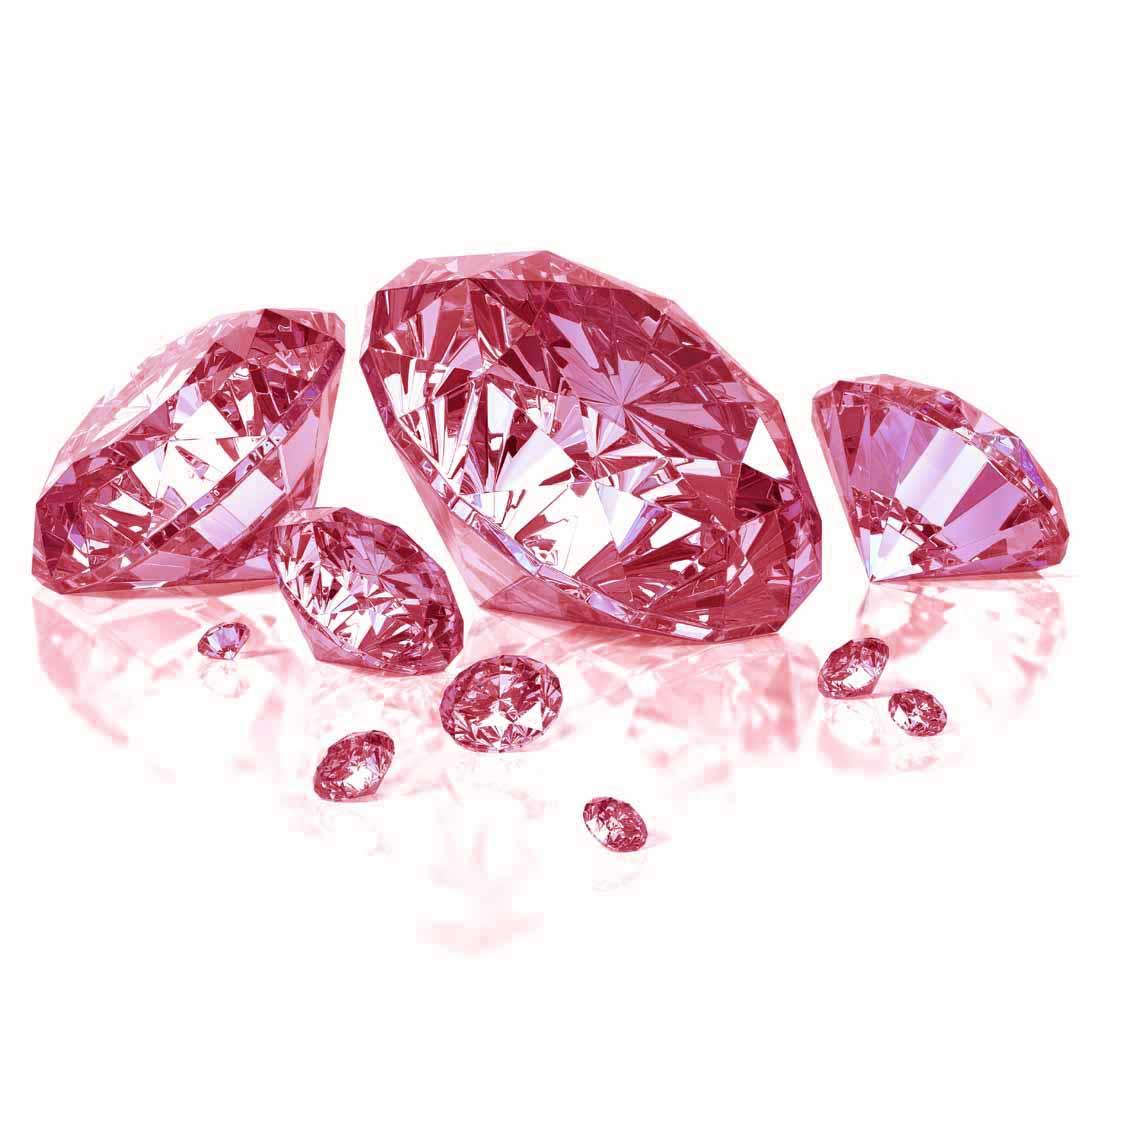 Wollpepar Diamond: Pink Diamond Wallpaper